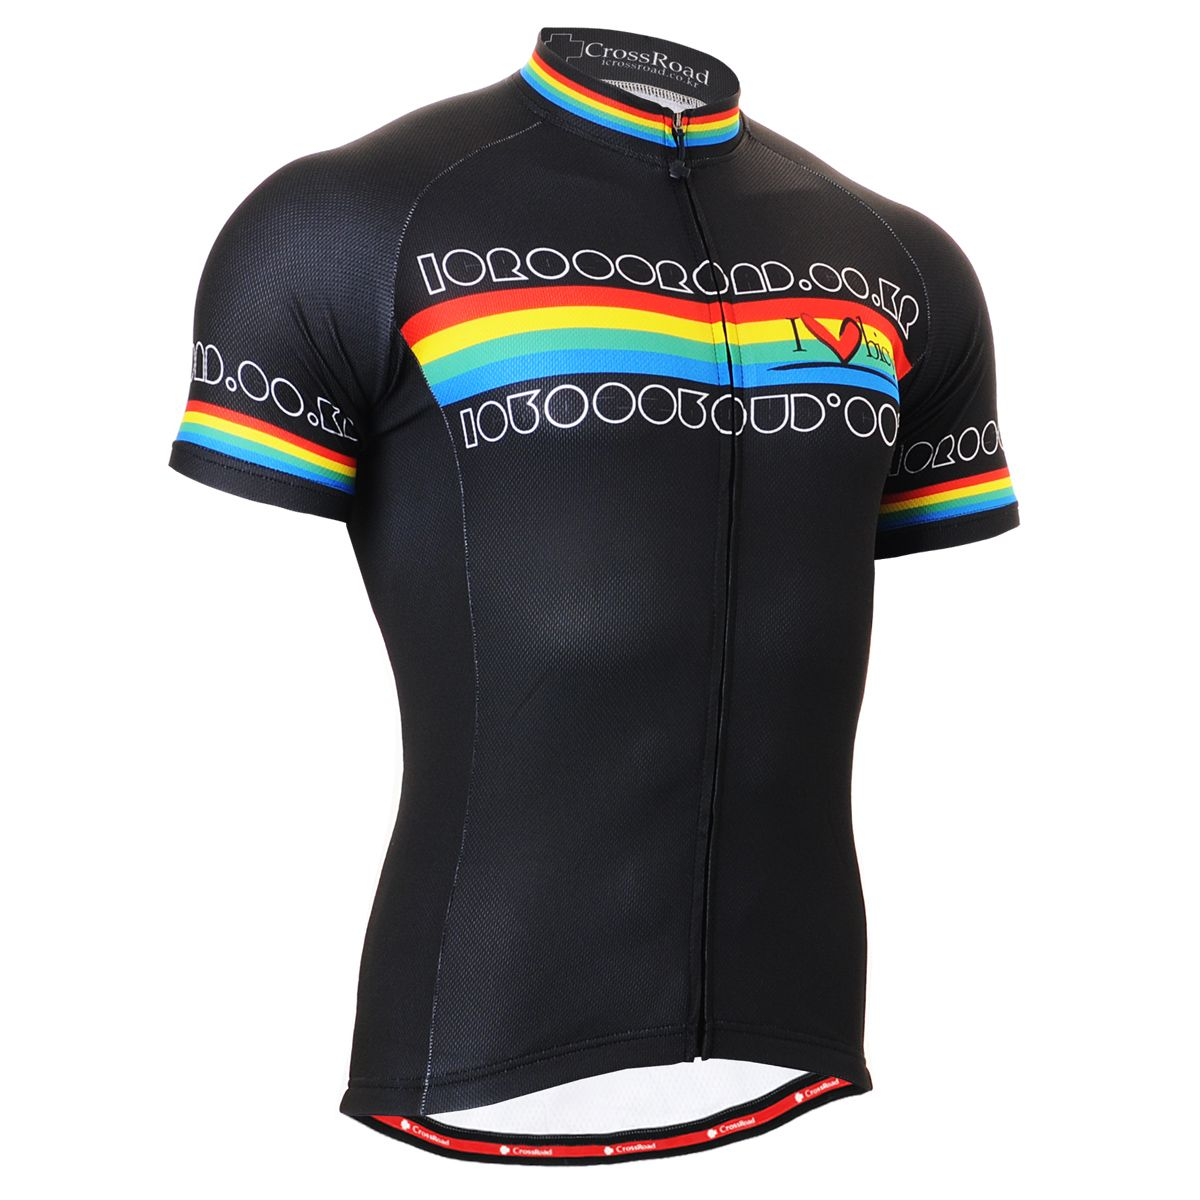 FIXGEAR CS-202 Men/'s Short Sleeve Cycling Jersey Bicycle Apparel Roadbike MTB